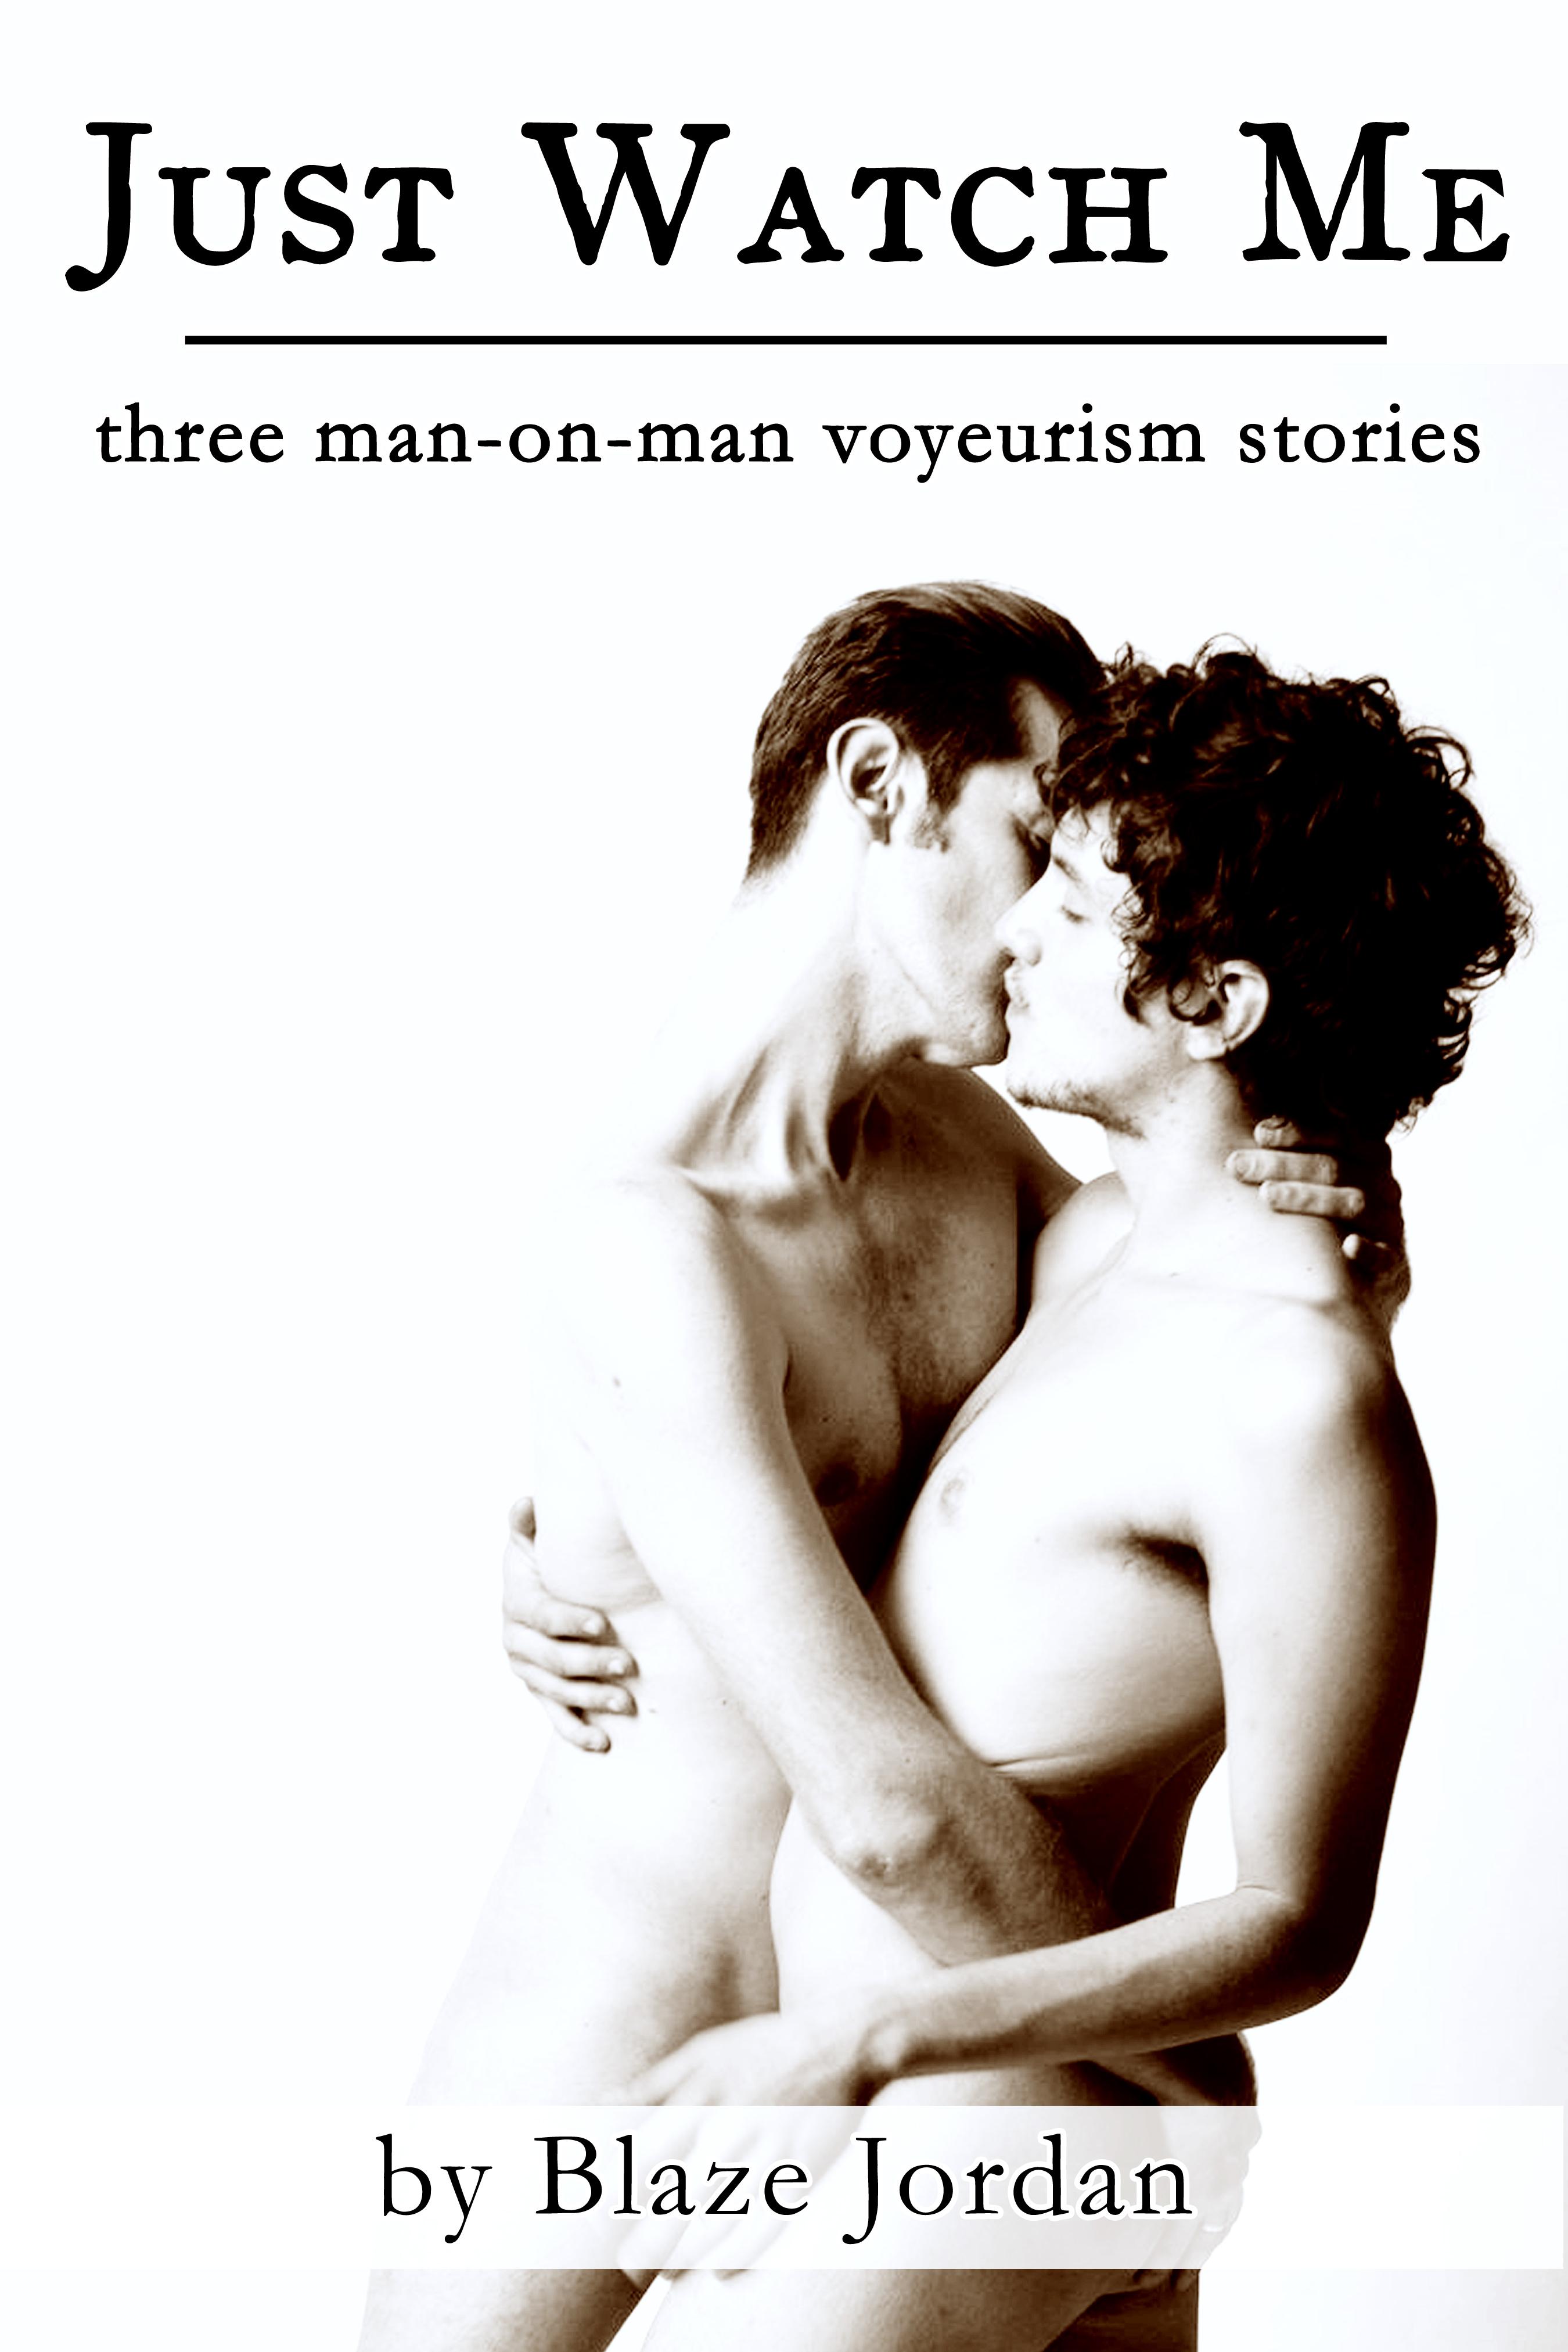 Just Watch Me: Three Man-on-Man Voyeurism Stories